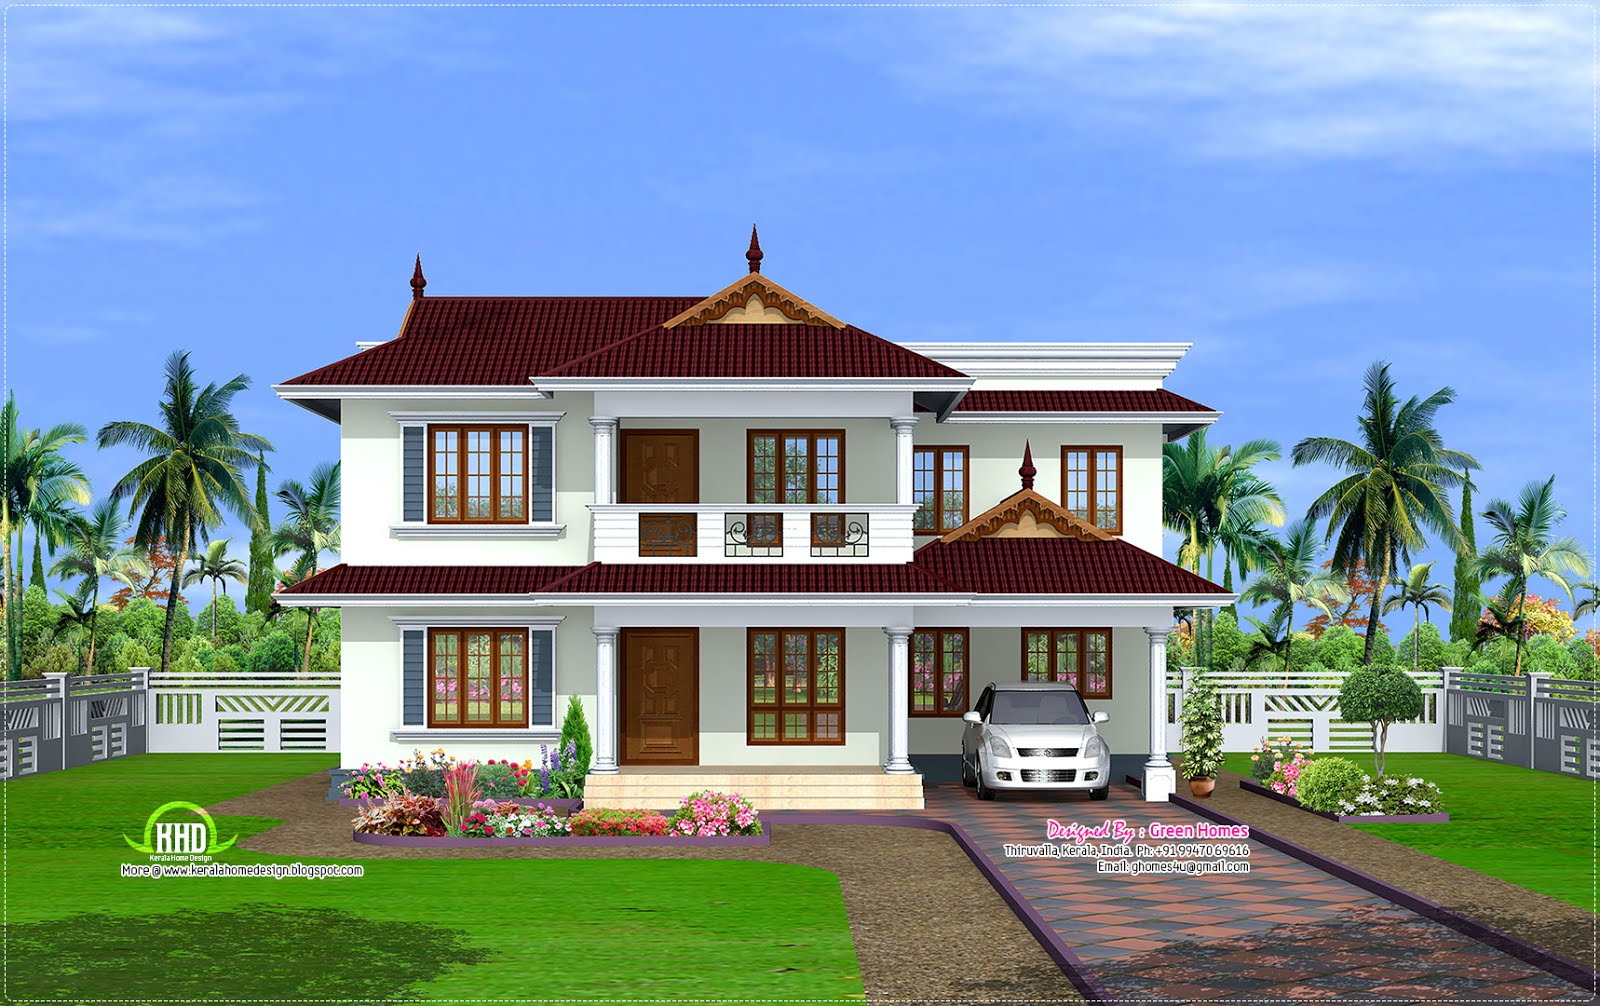 Stupendous House Plans Models Kerala Traditional Nalukettu Model Kerala Largest Home Design Picture Inspirations Pitcheantrous